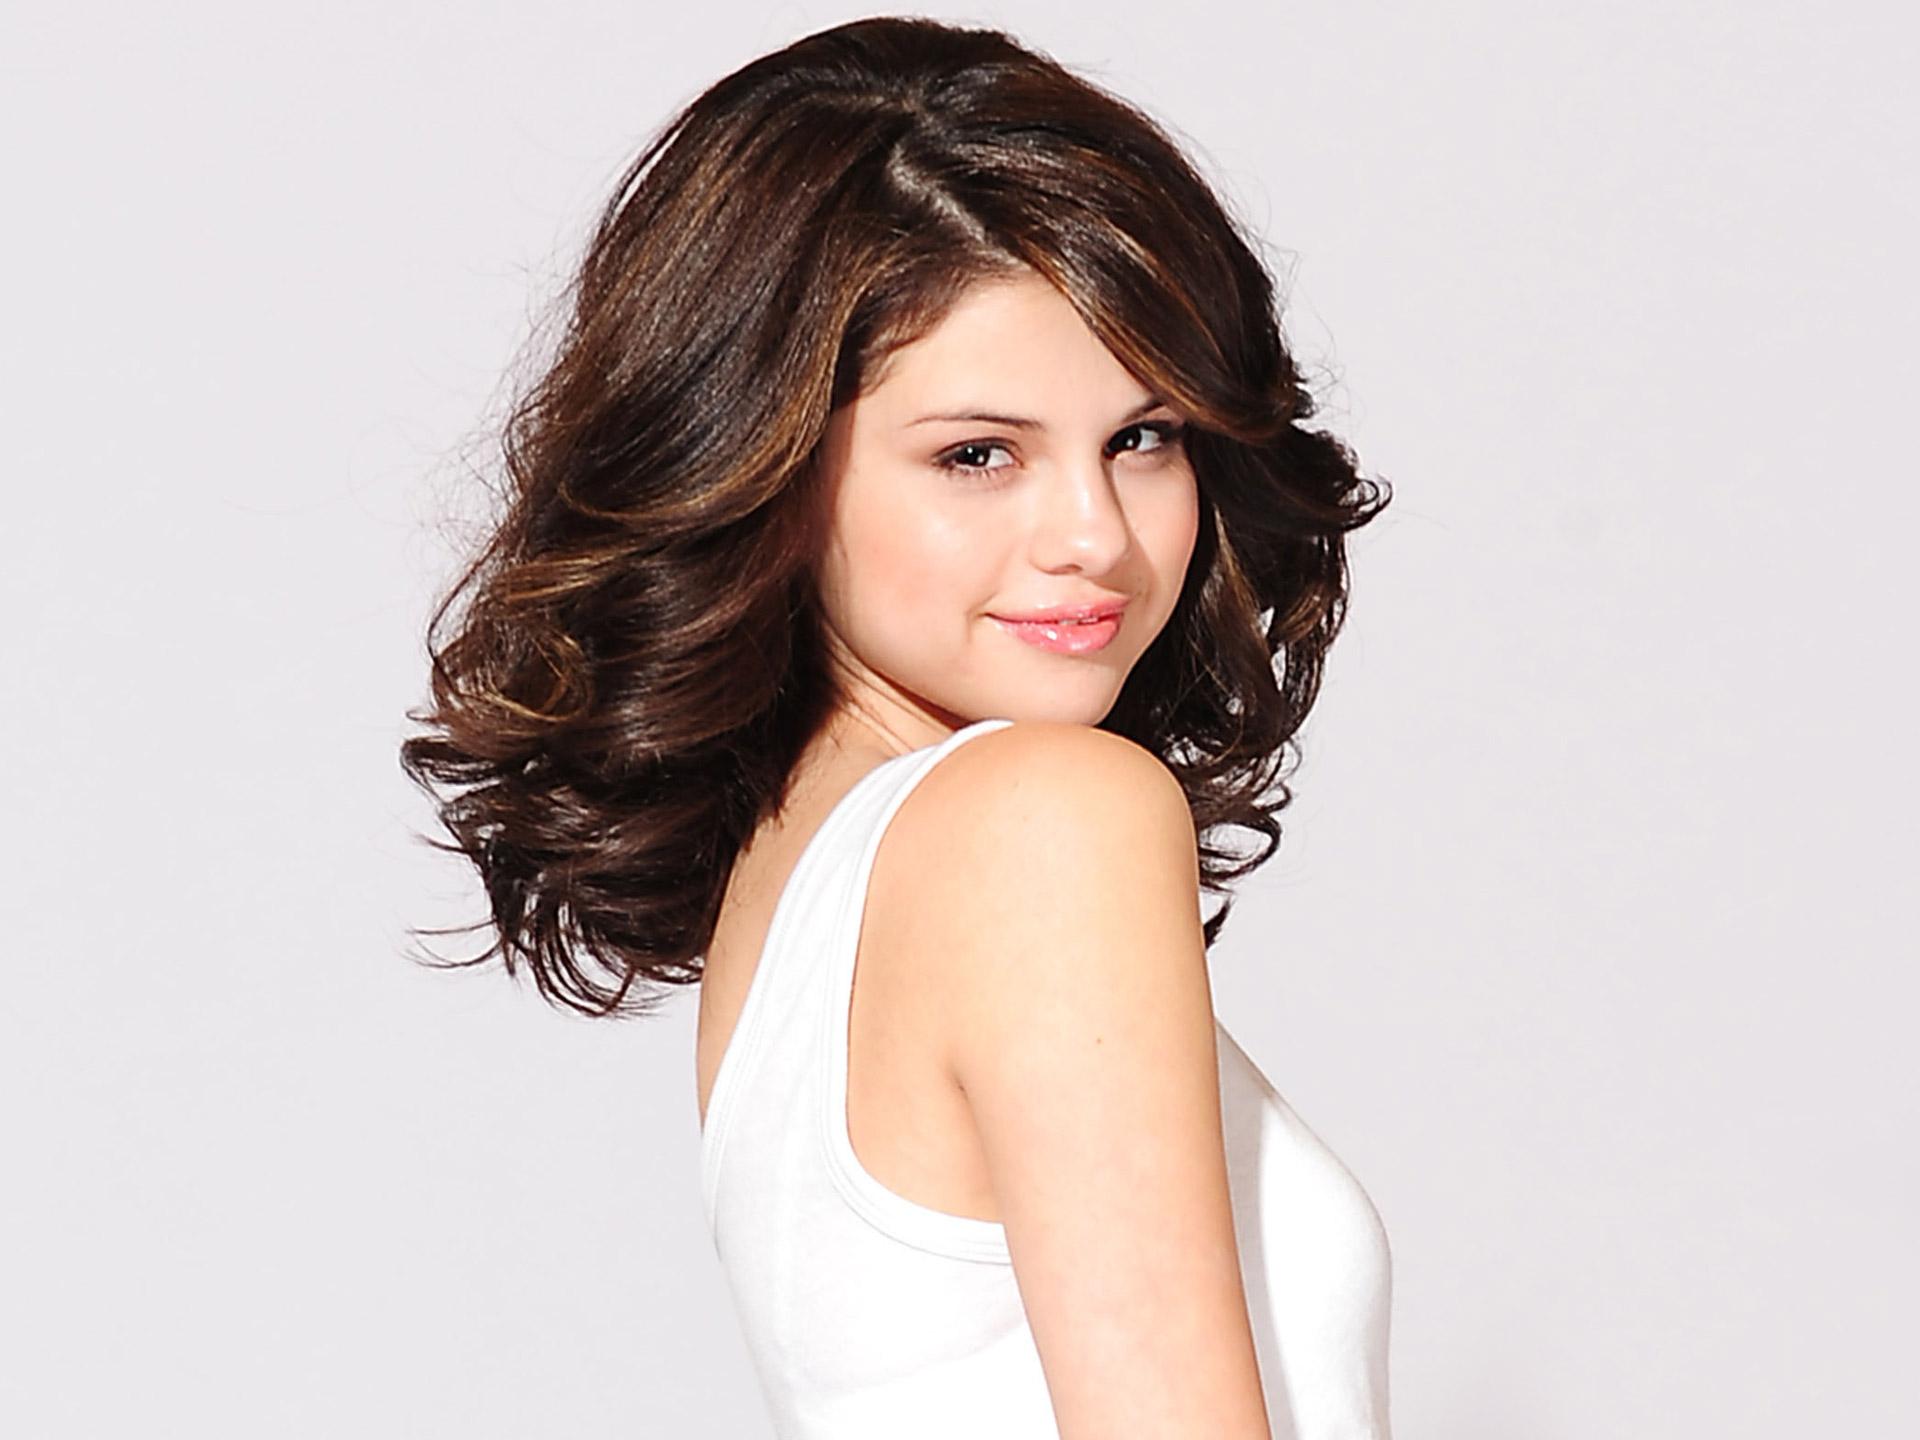 Selena Gomez Hot Girls HD Wallpaper of Celebrities   hdwallpaper2013 1920x1440